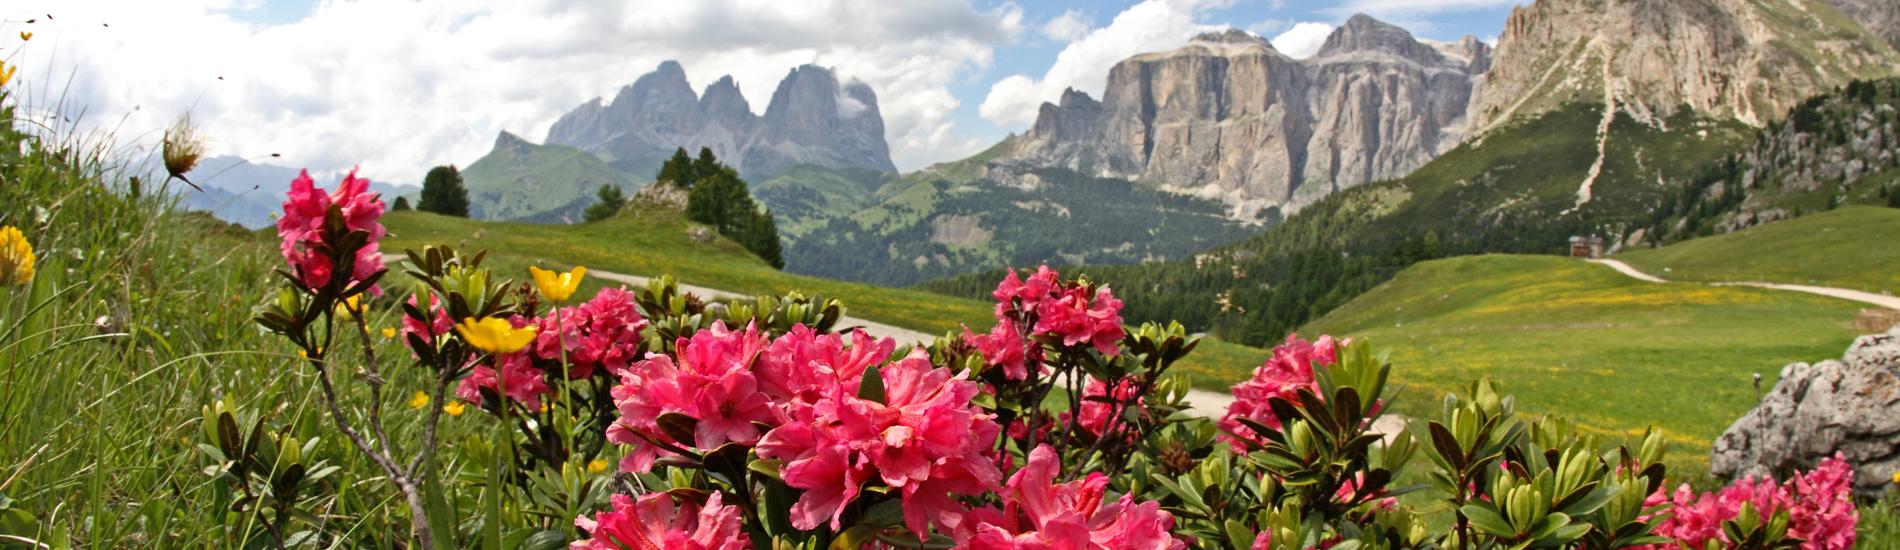 Vacaze Estive in Trentino Alto Adige